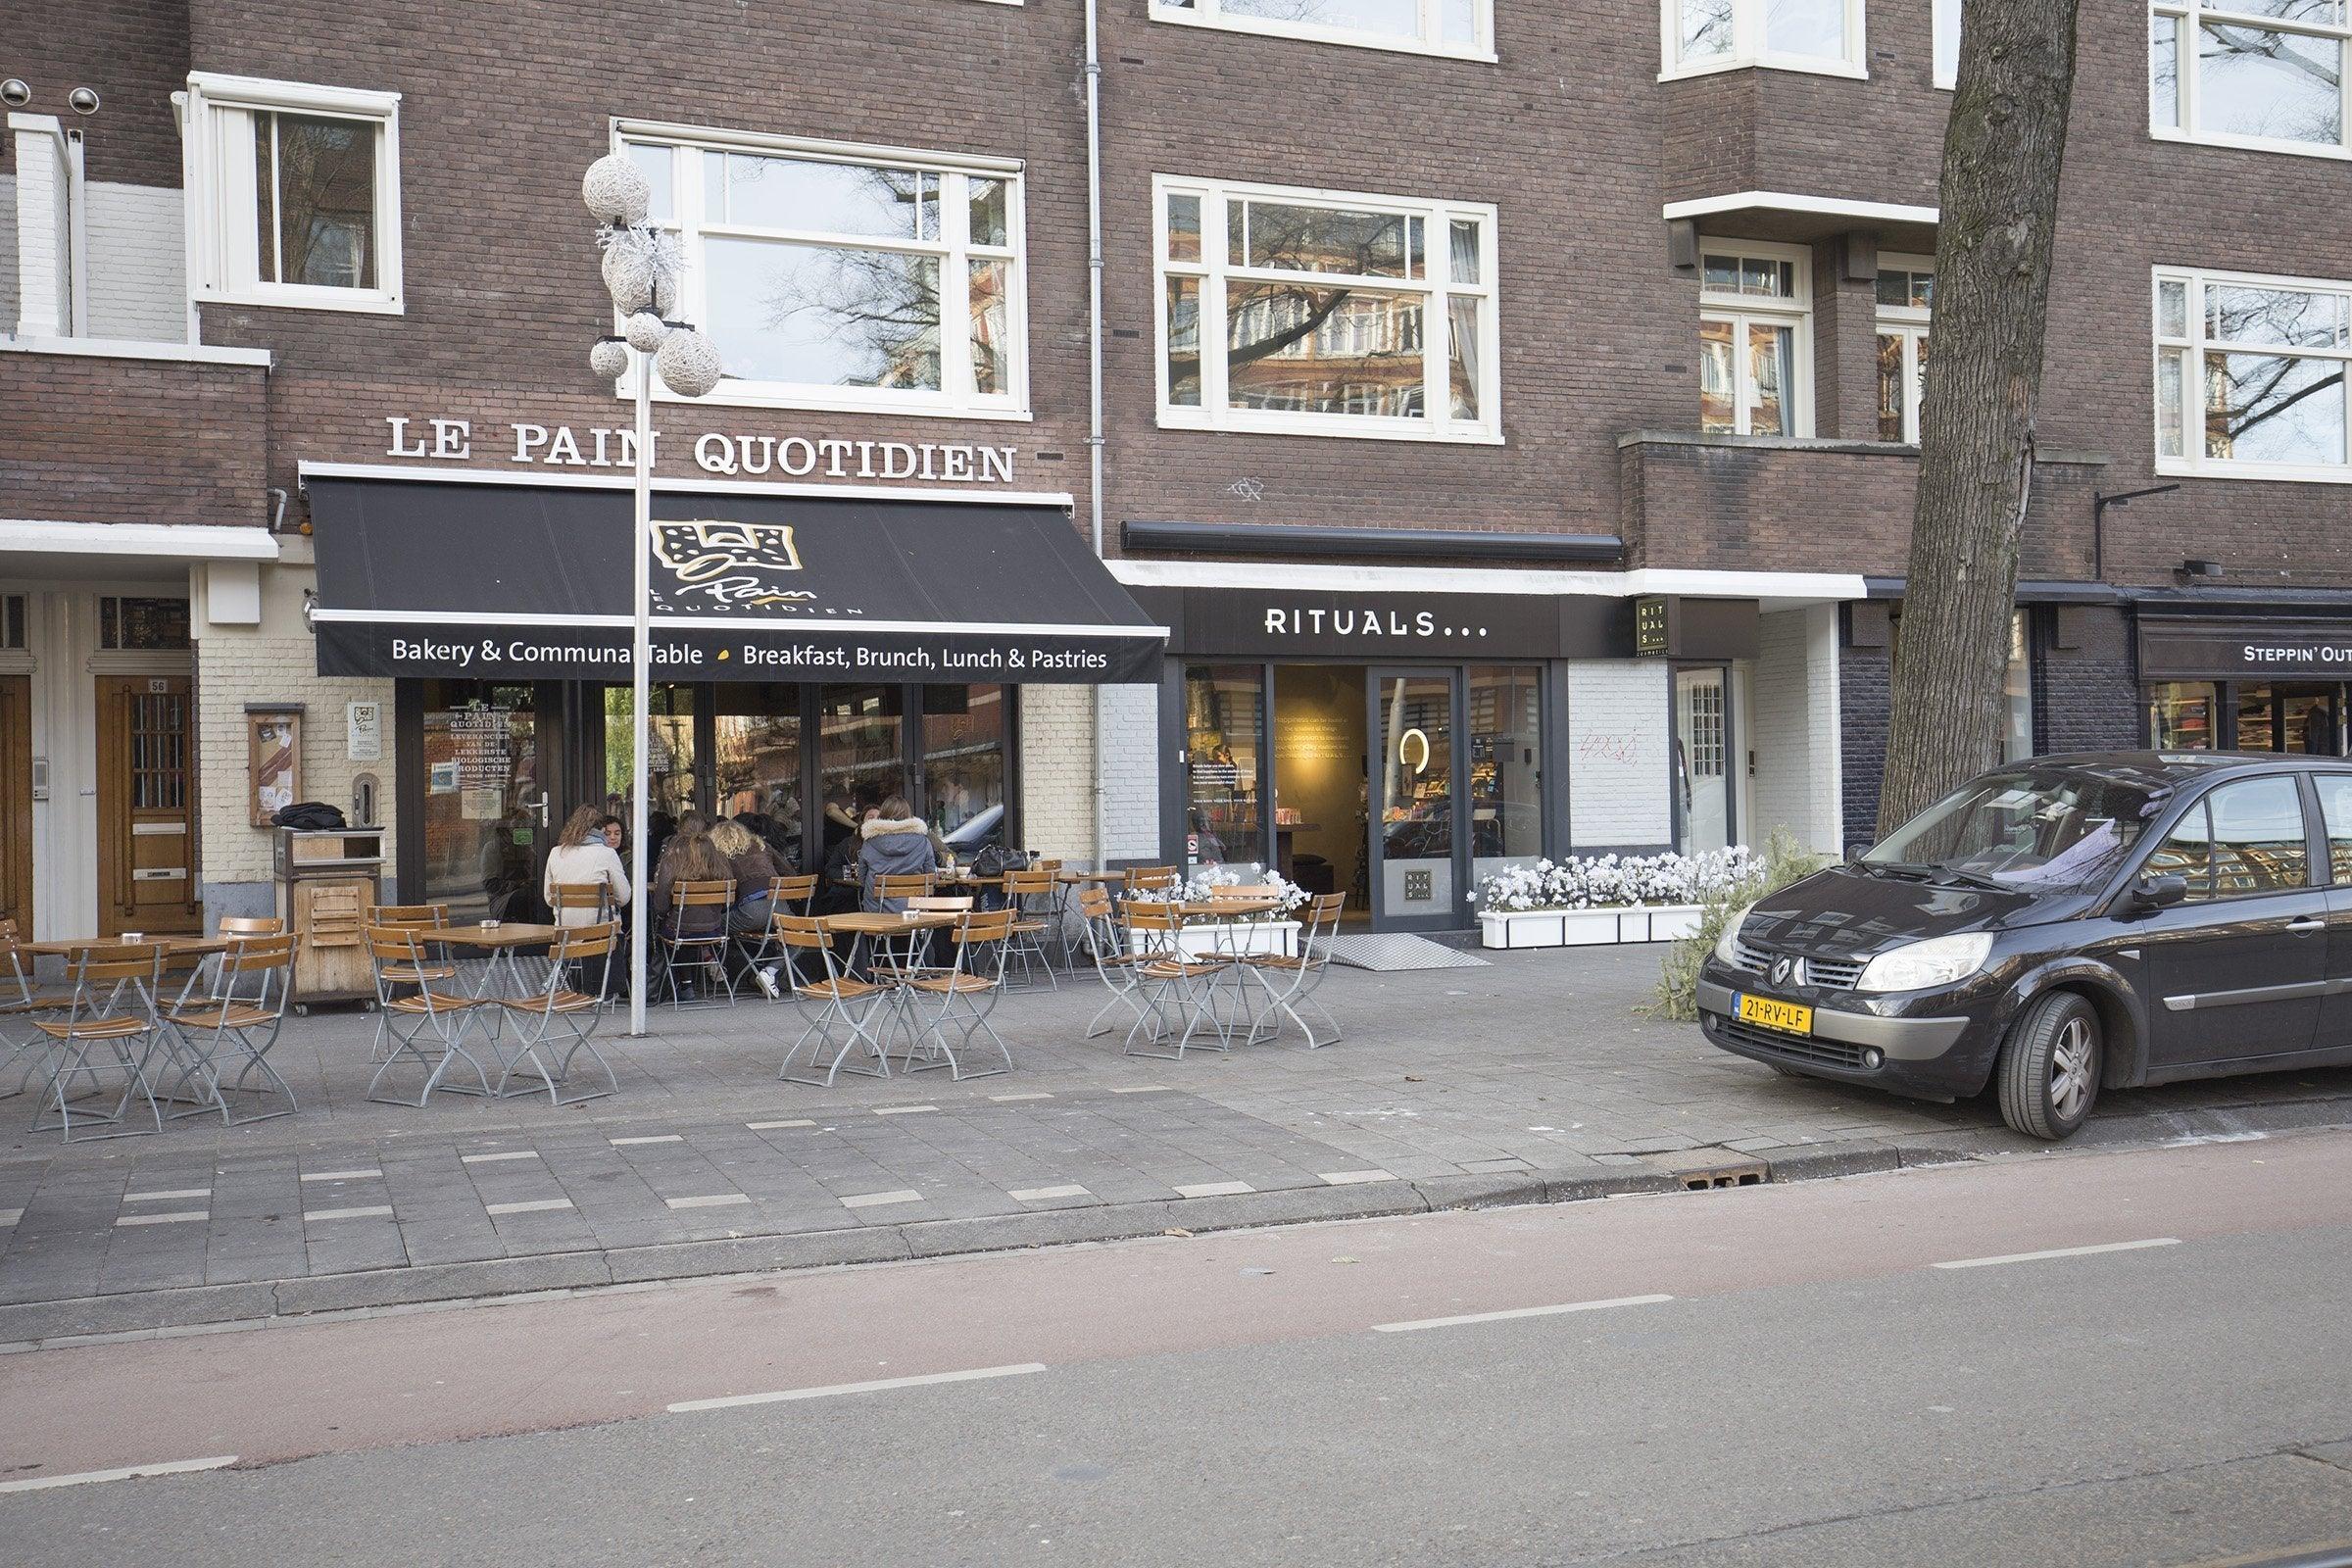 https://public.parariusoffice.nl/15/photos/huge/51221817.1494850072-374.jpg